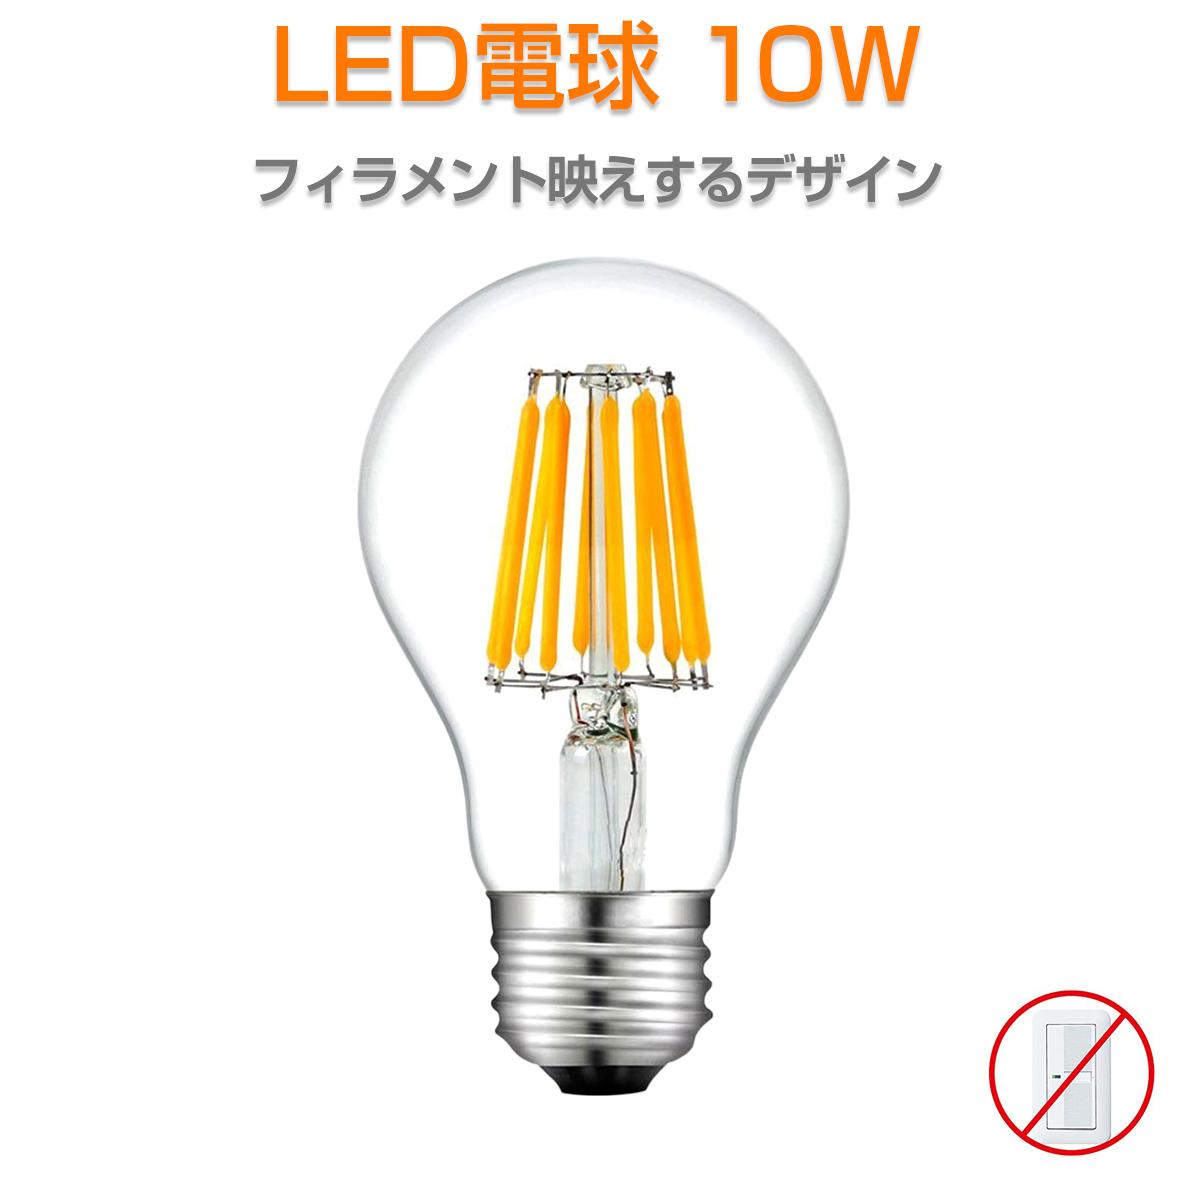 LED電球 フィラメント 10W 100W形相当 電球色(2700K)/昼白光(6000K) E26口金 A60 レトロエジソン クリアガラス 一般電球 全方向タイプ 調光器 ホタルスイッチ非対応 1個入り 宅配便送料無料 3ヶ月保証 K&M